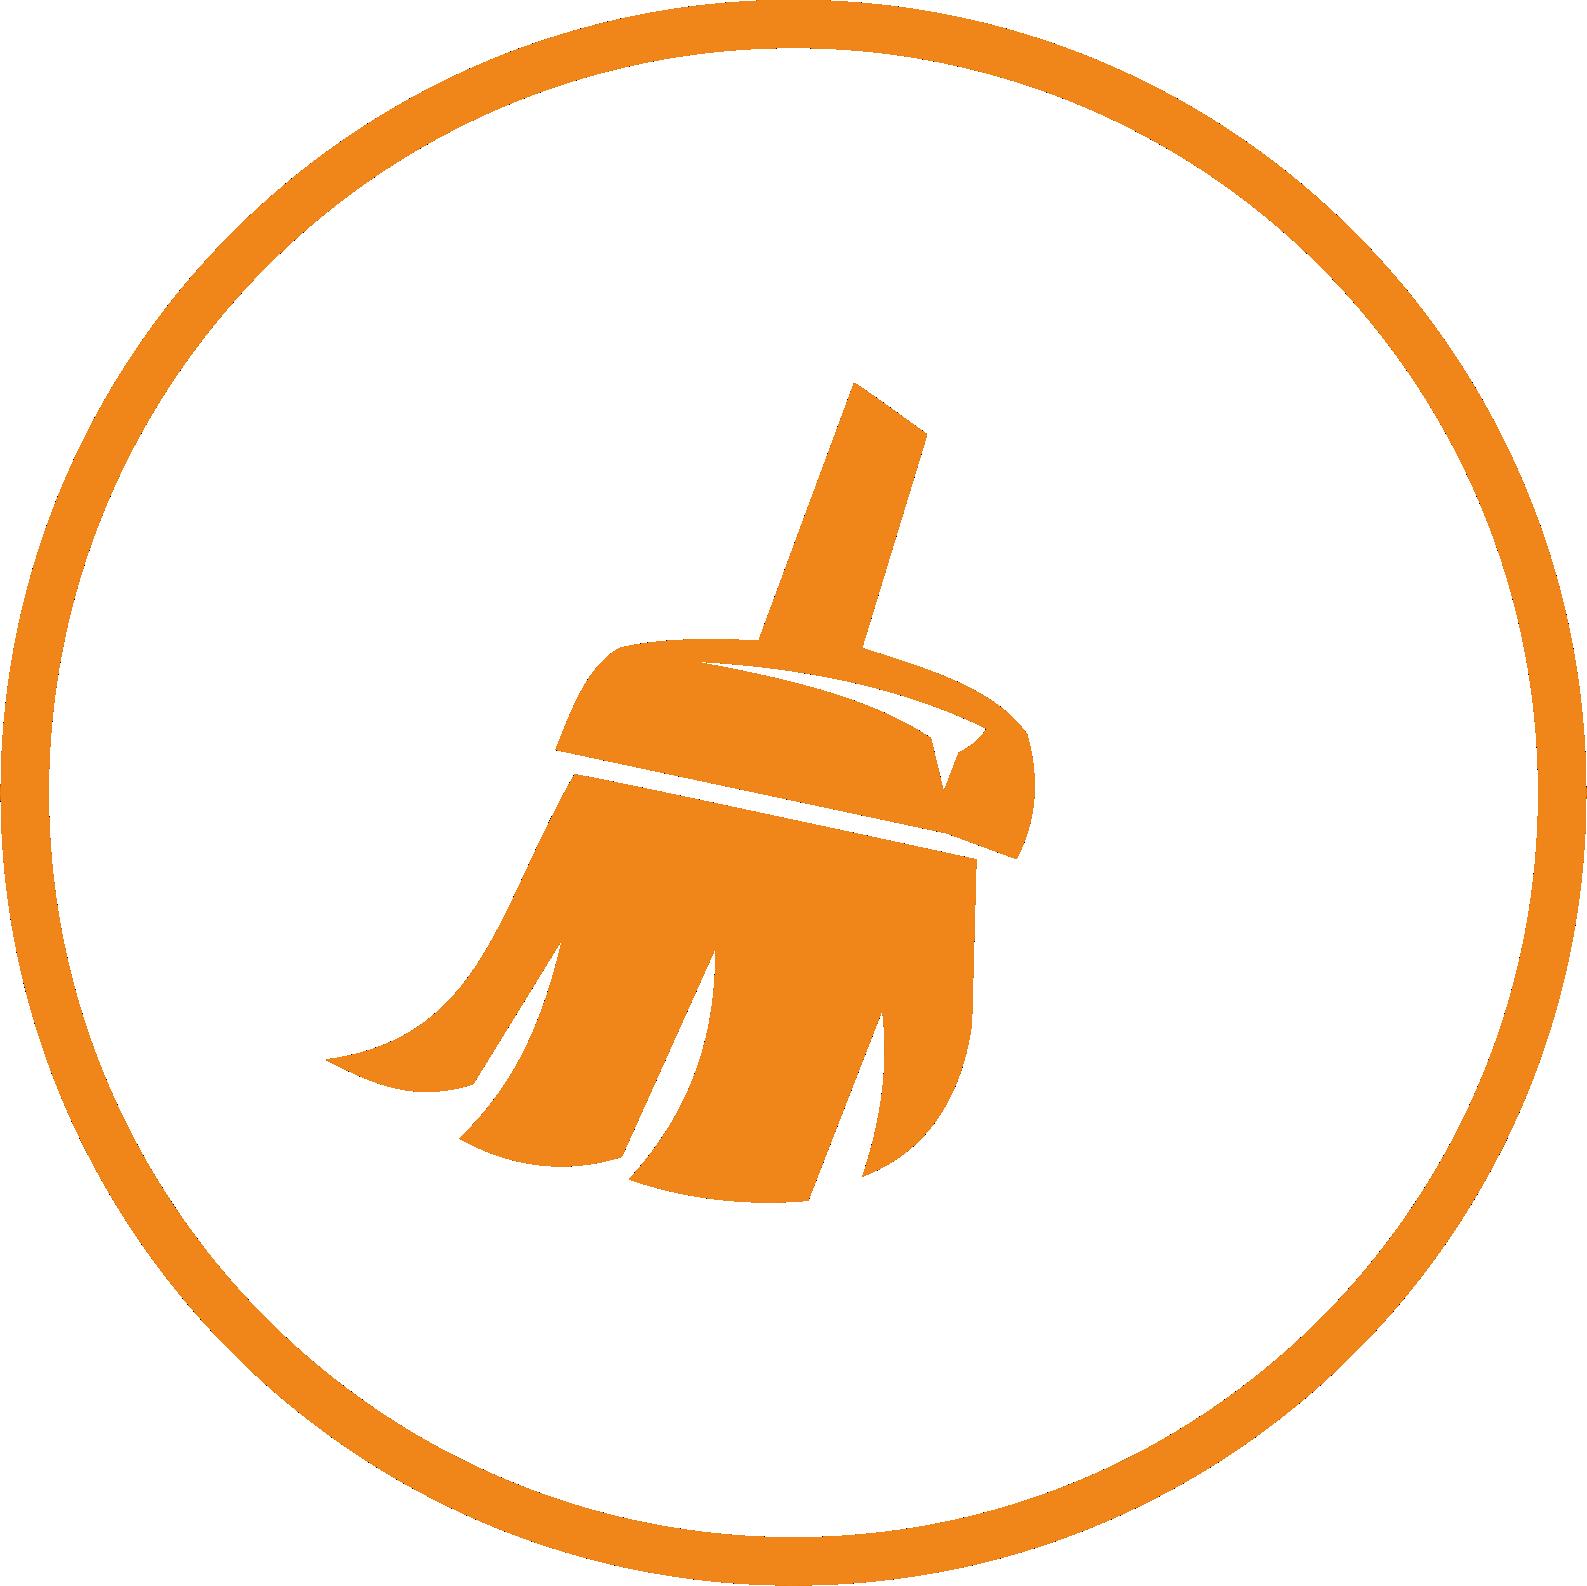 PNG Kebersihan - 51036